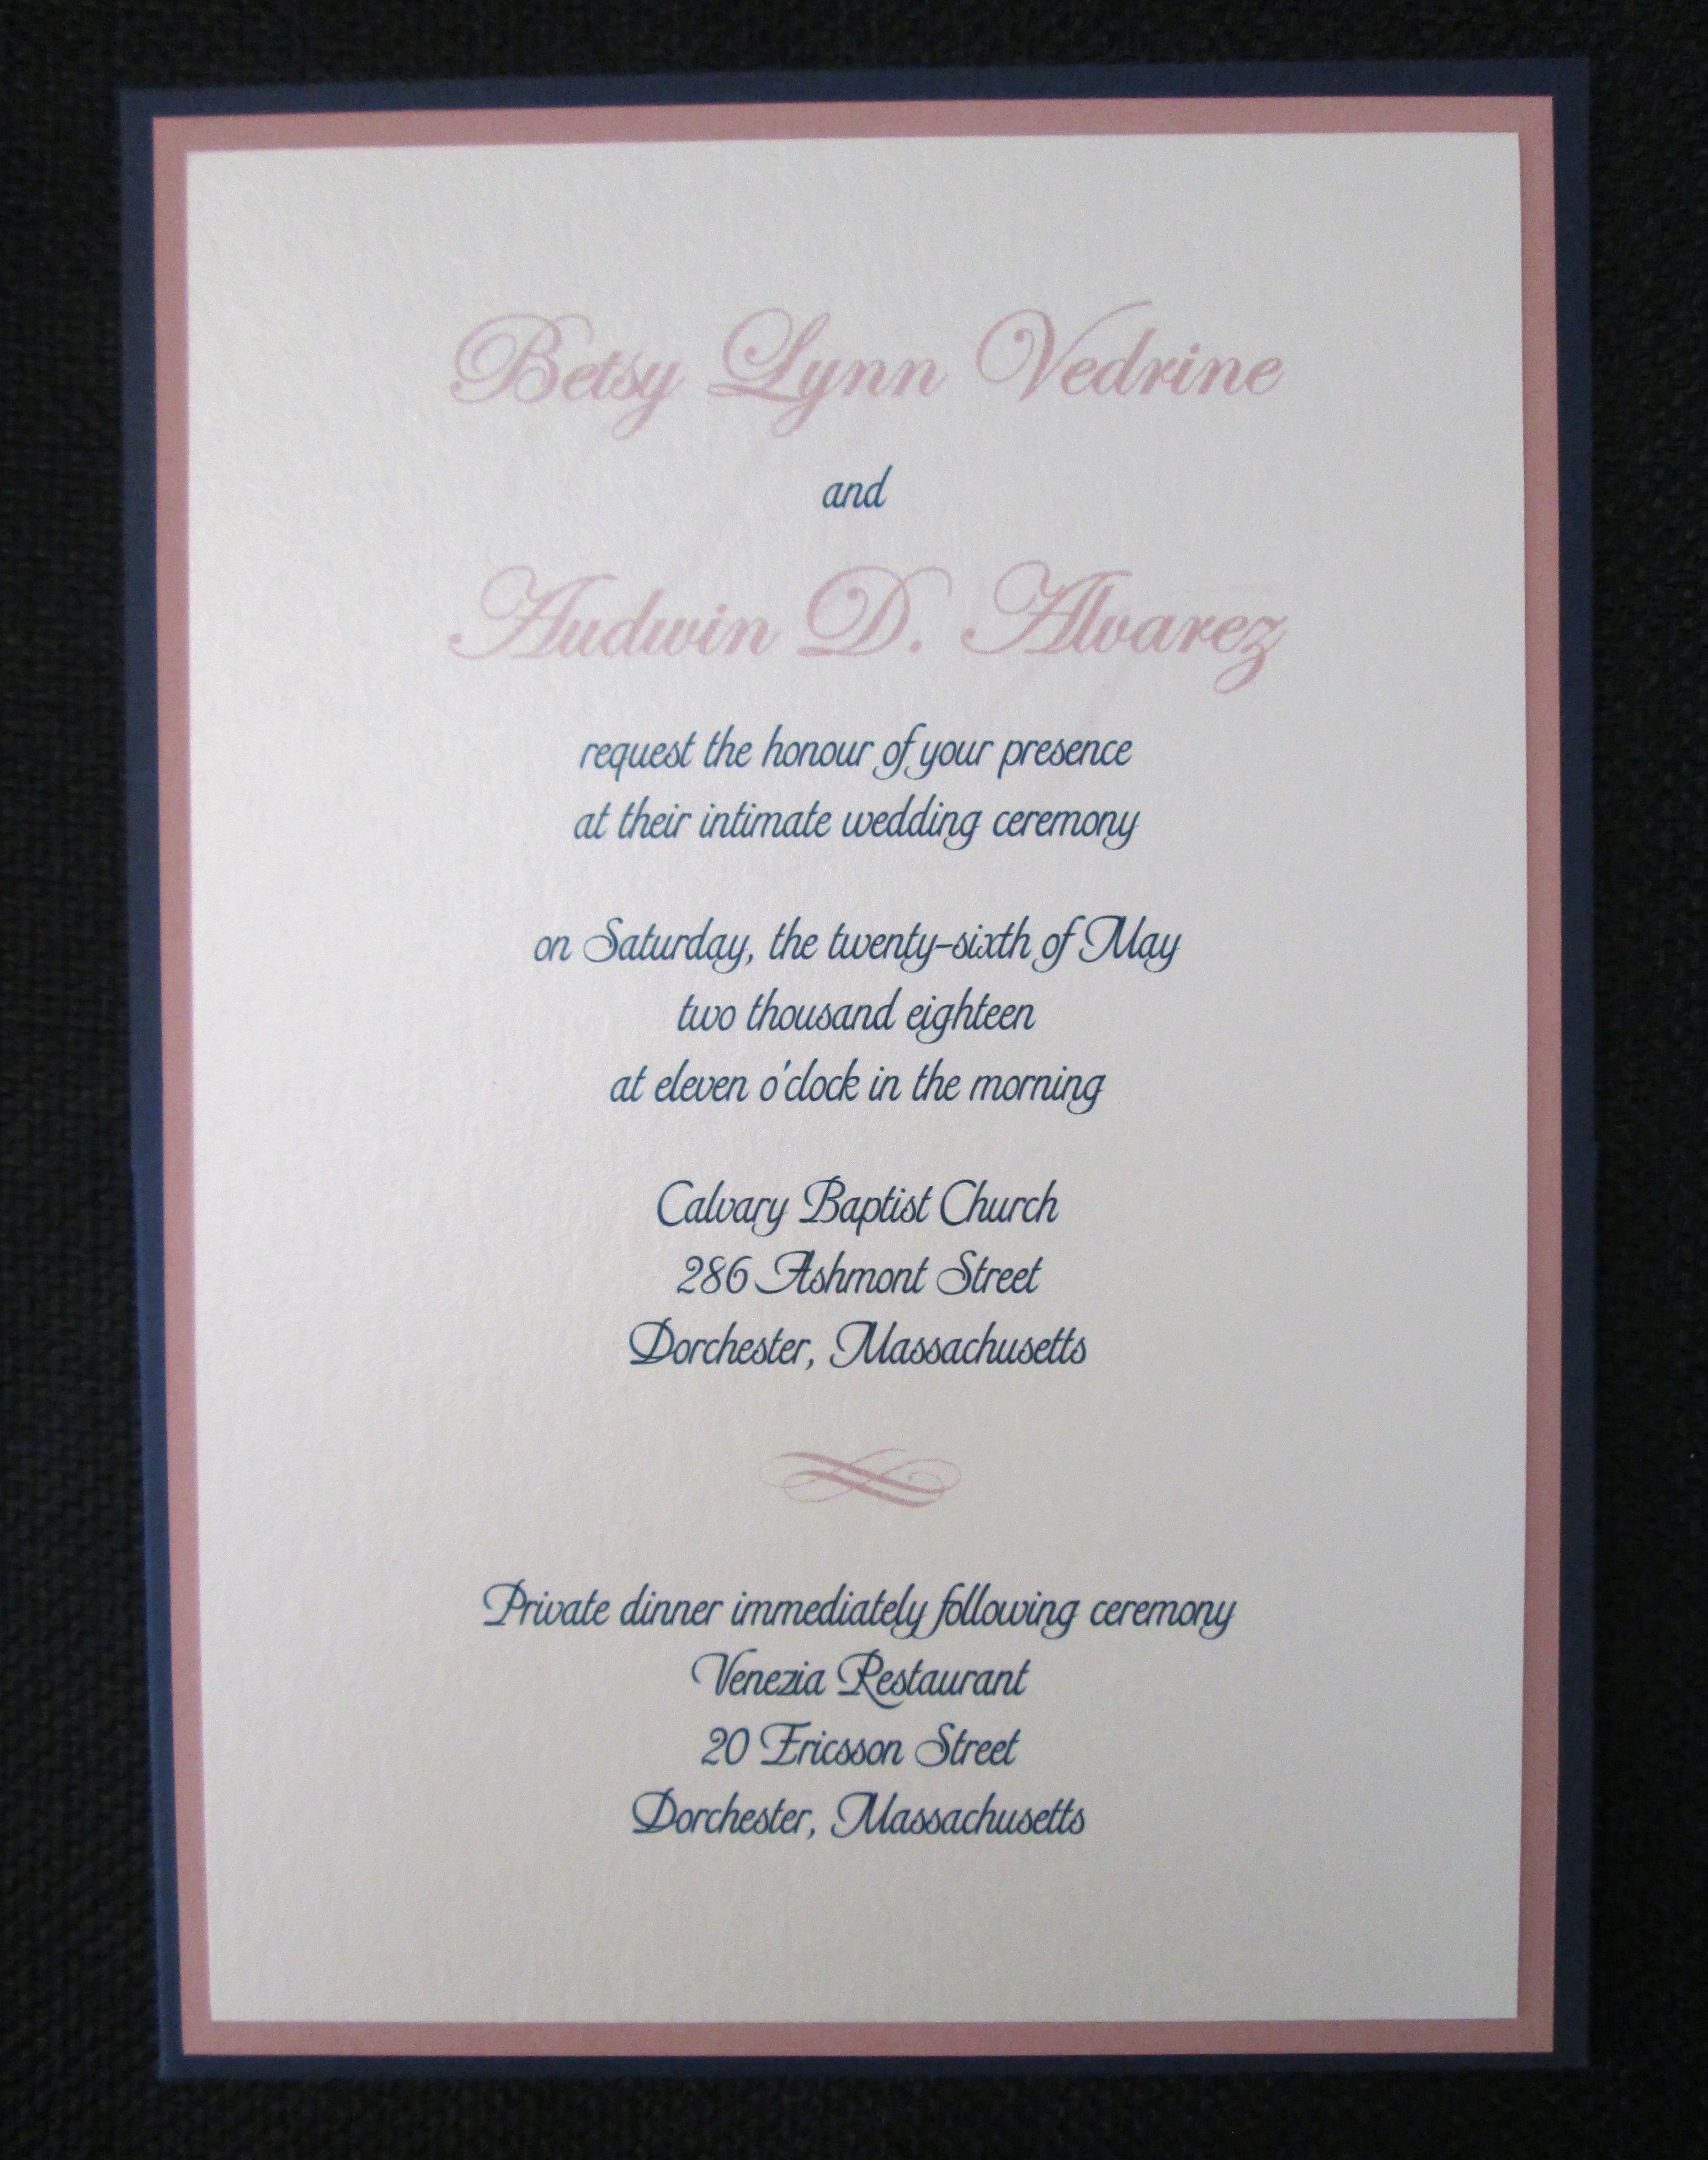 Wedding Invitation With Watermark Monogram Making Invitations Custom Day: Pi Day Wedding Cards At Websimilar.org